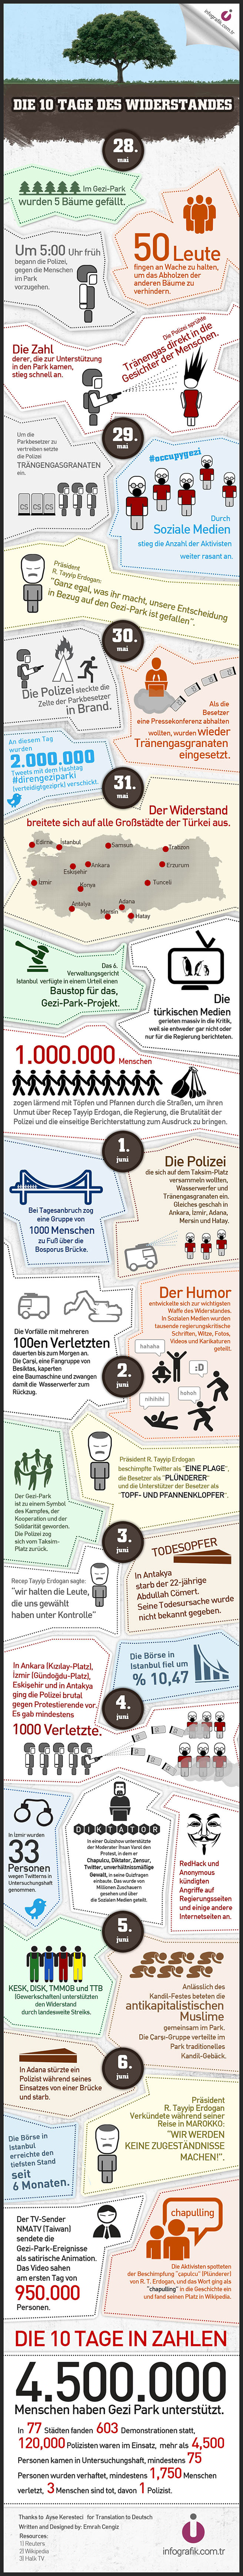 Gezi Parki infografik German